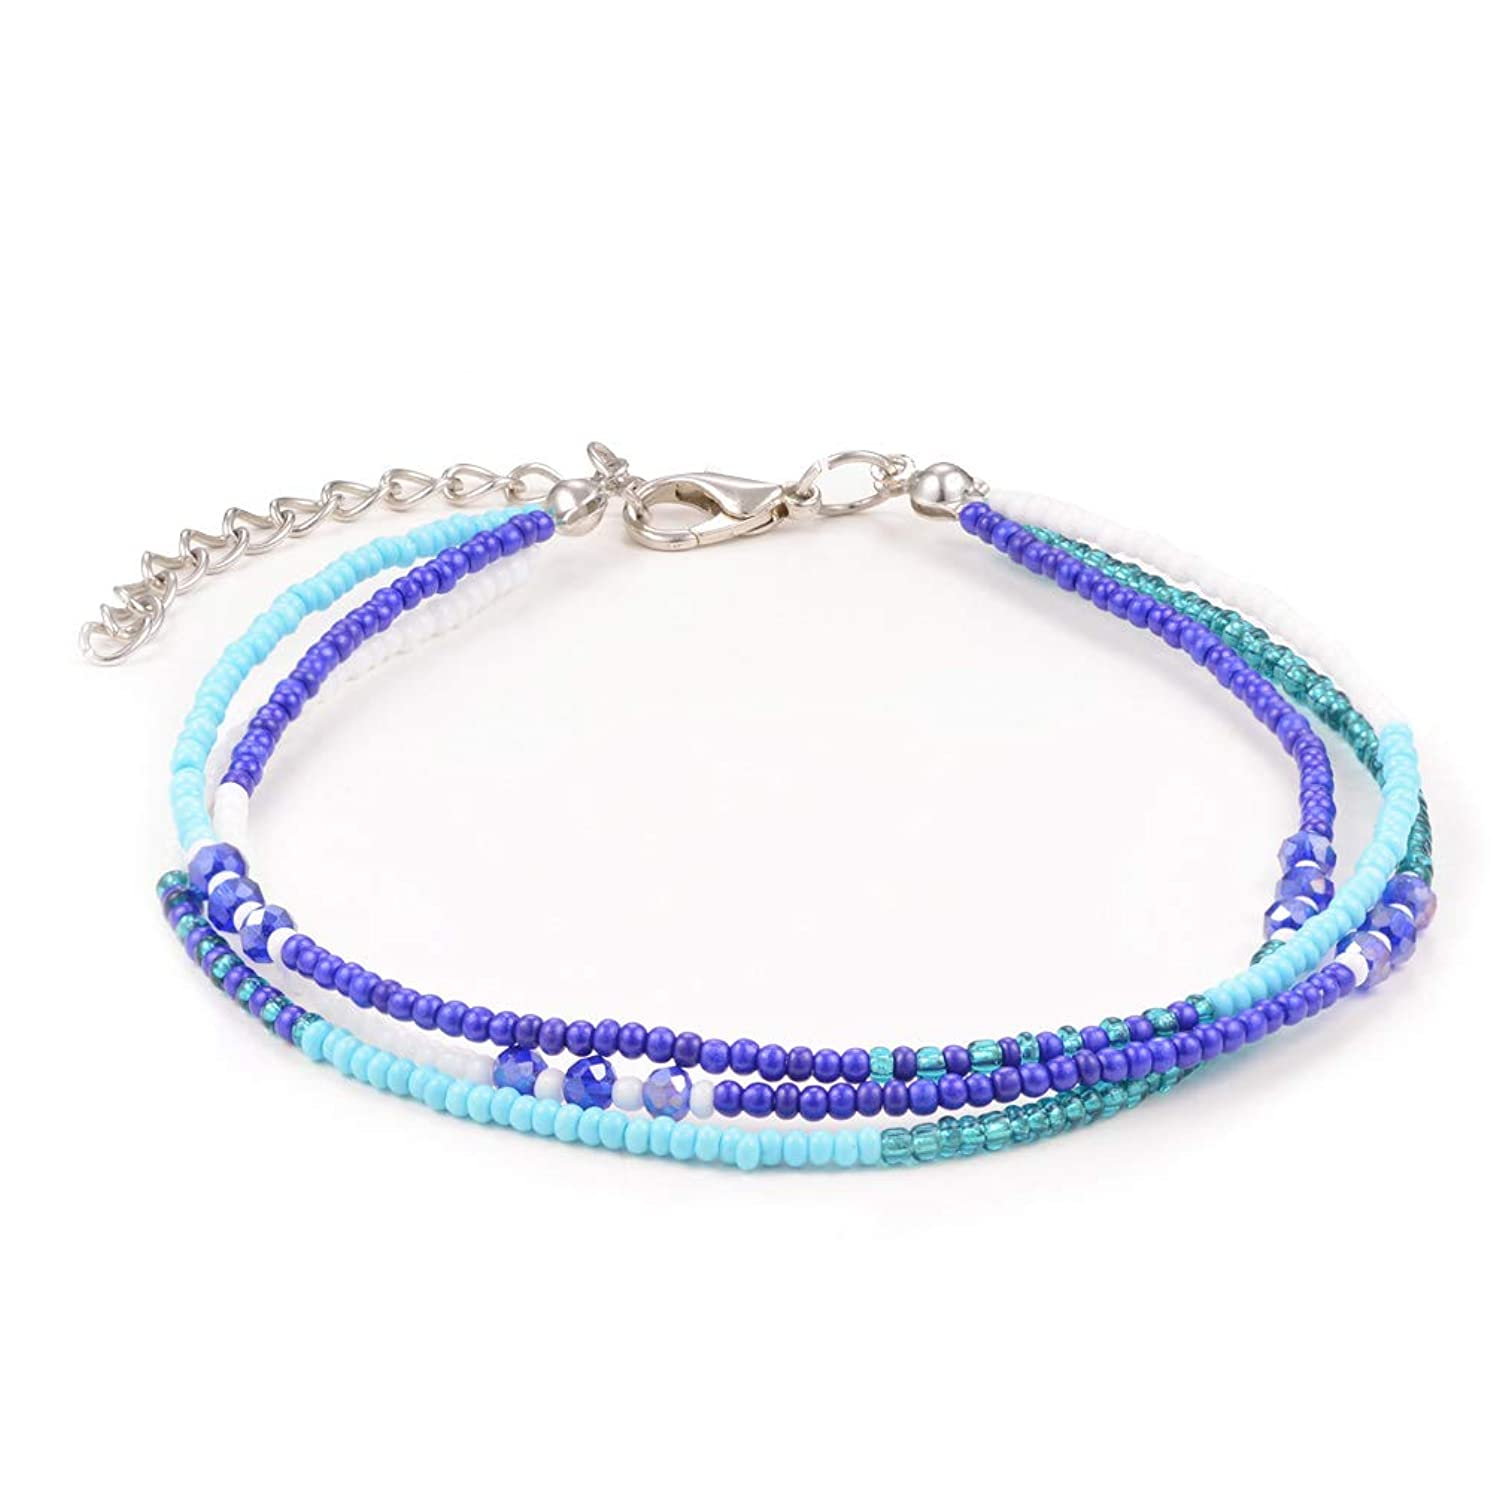 Jeka Handmade Adjustable Friendship Anklets Layered Boho Beach Waterproof Seed Beads Jewelry Gifts for Women Teen Girls